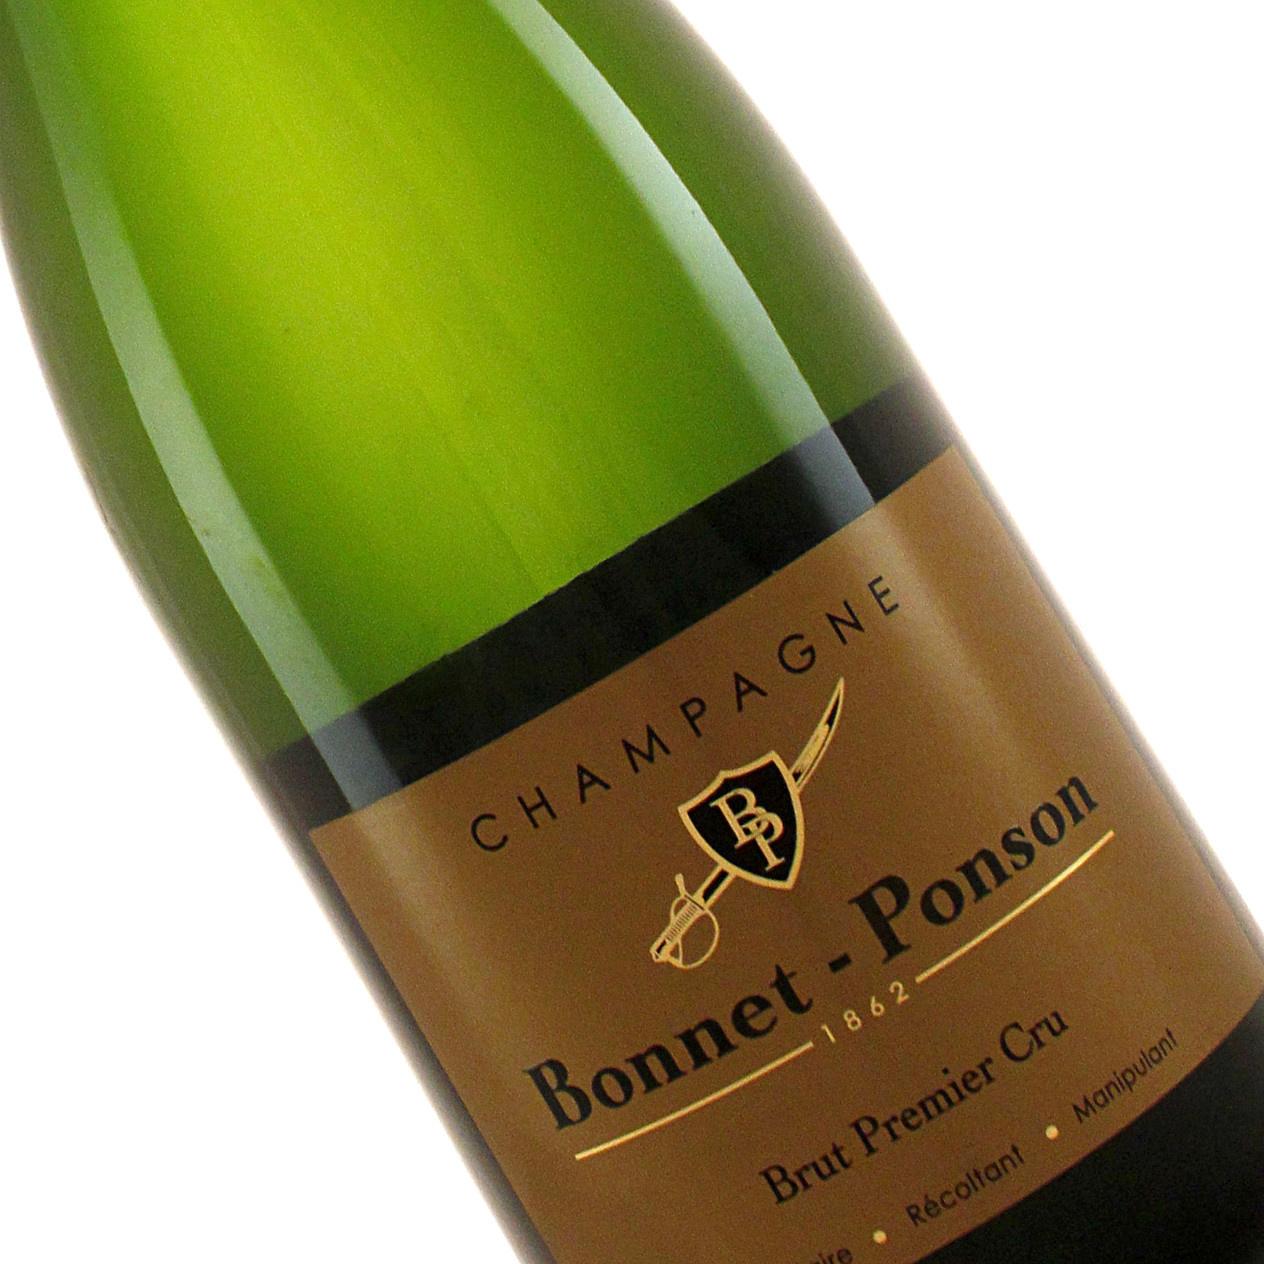 Bonnet-Ponson NV Brut Premier Cru, Champagne